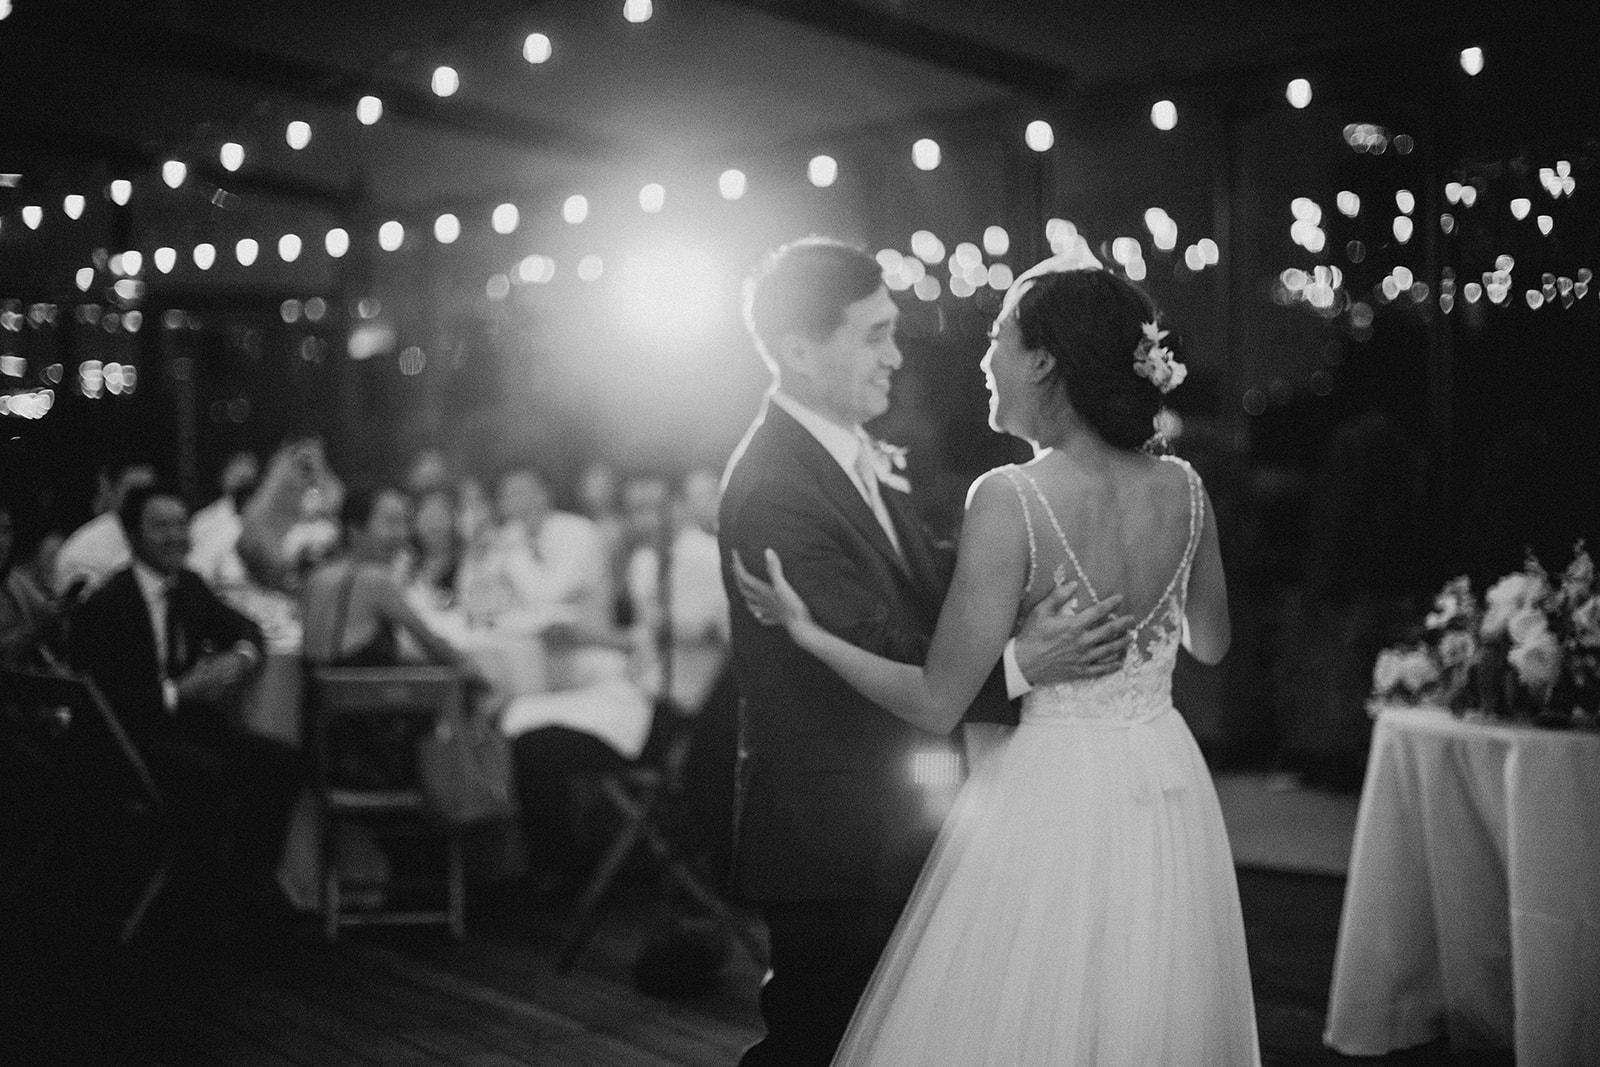 JWHJ-married-490.jpg